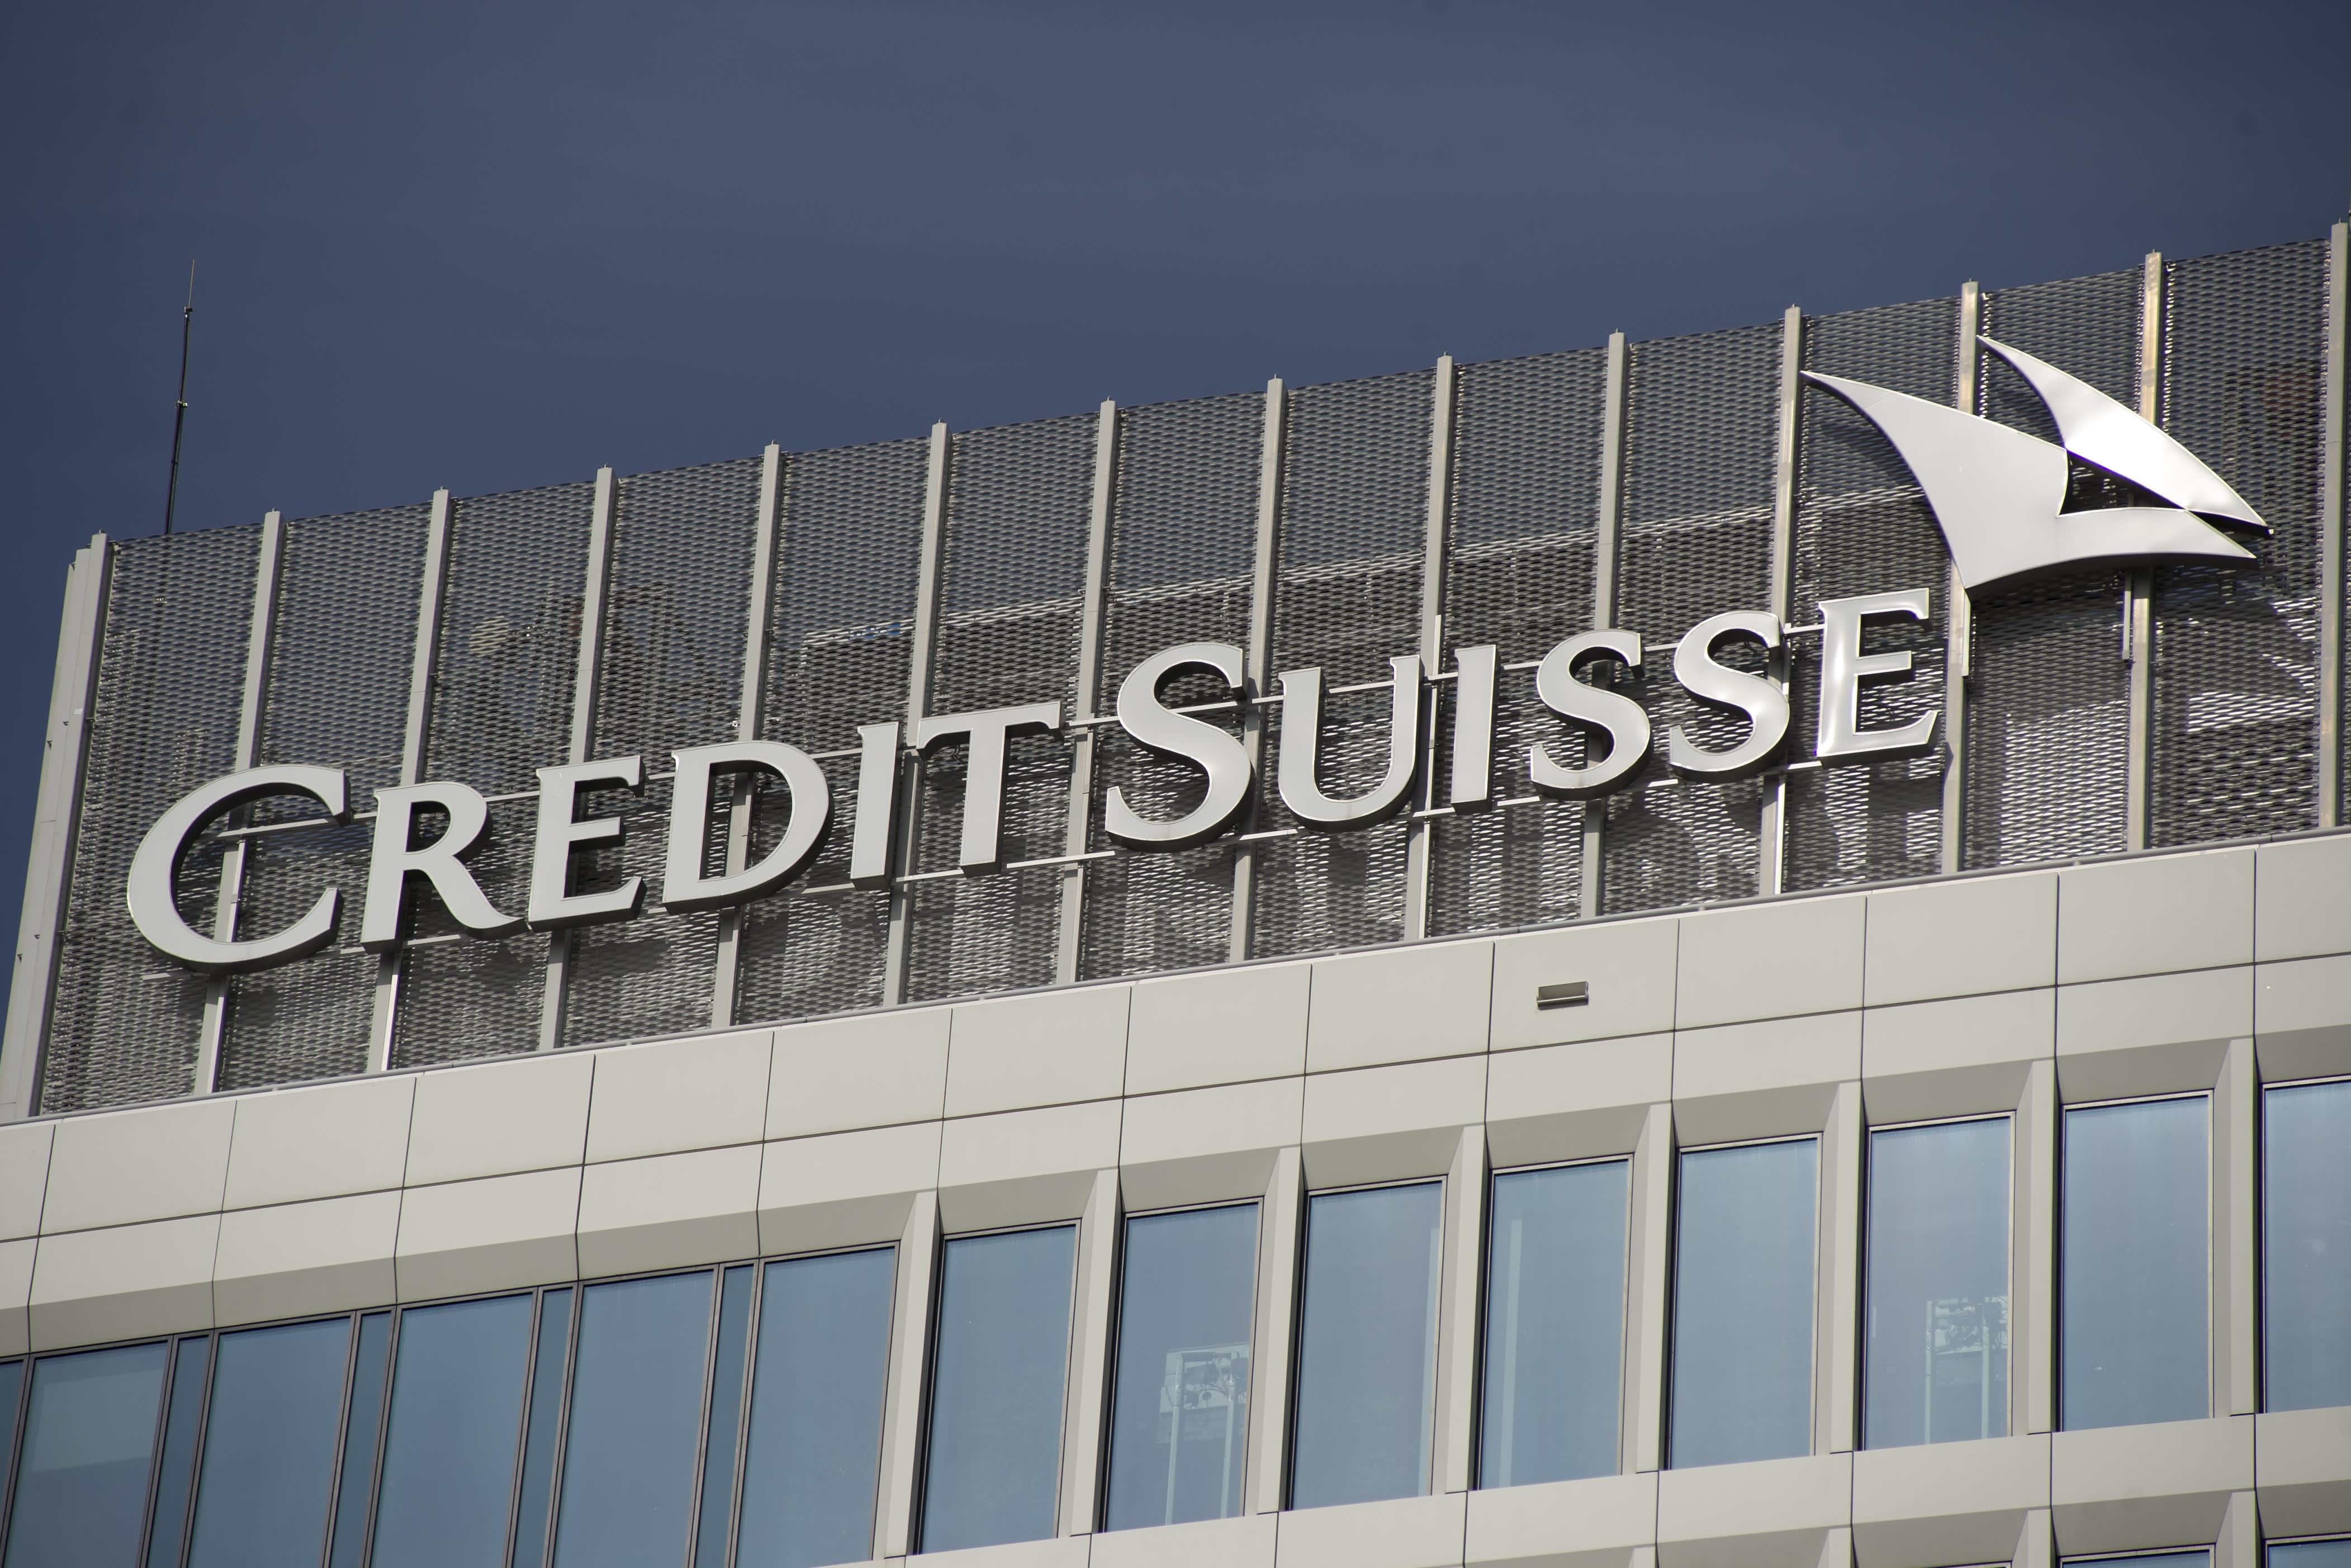 Credit Suisse is giving junior bankers special $20,000 bonuses, raises after Goldman analyst revolt